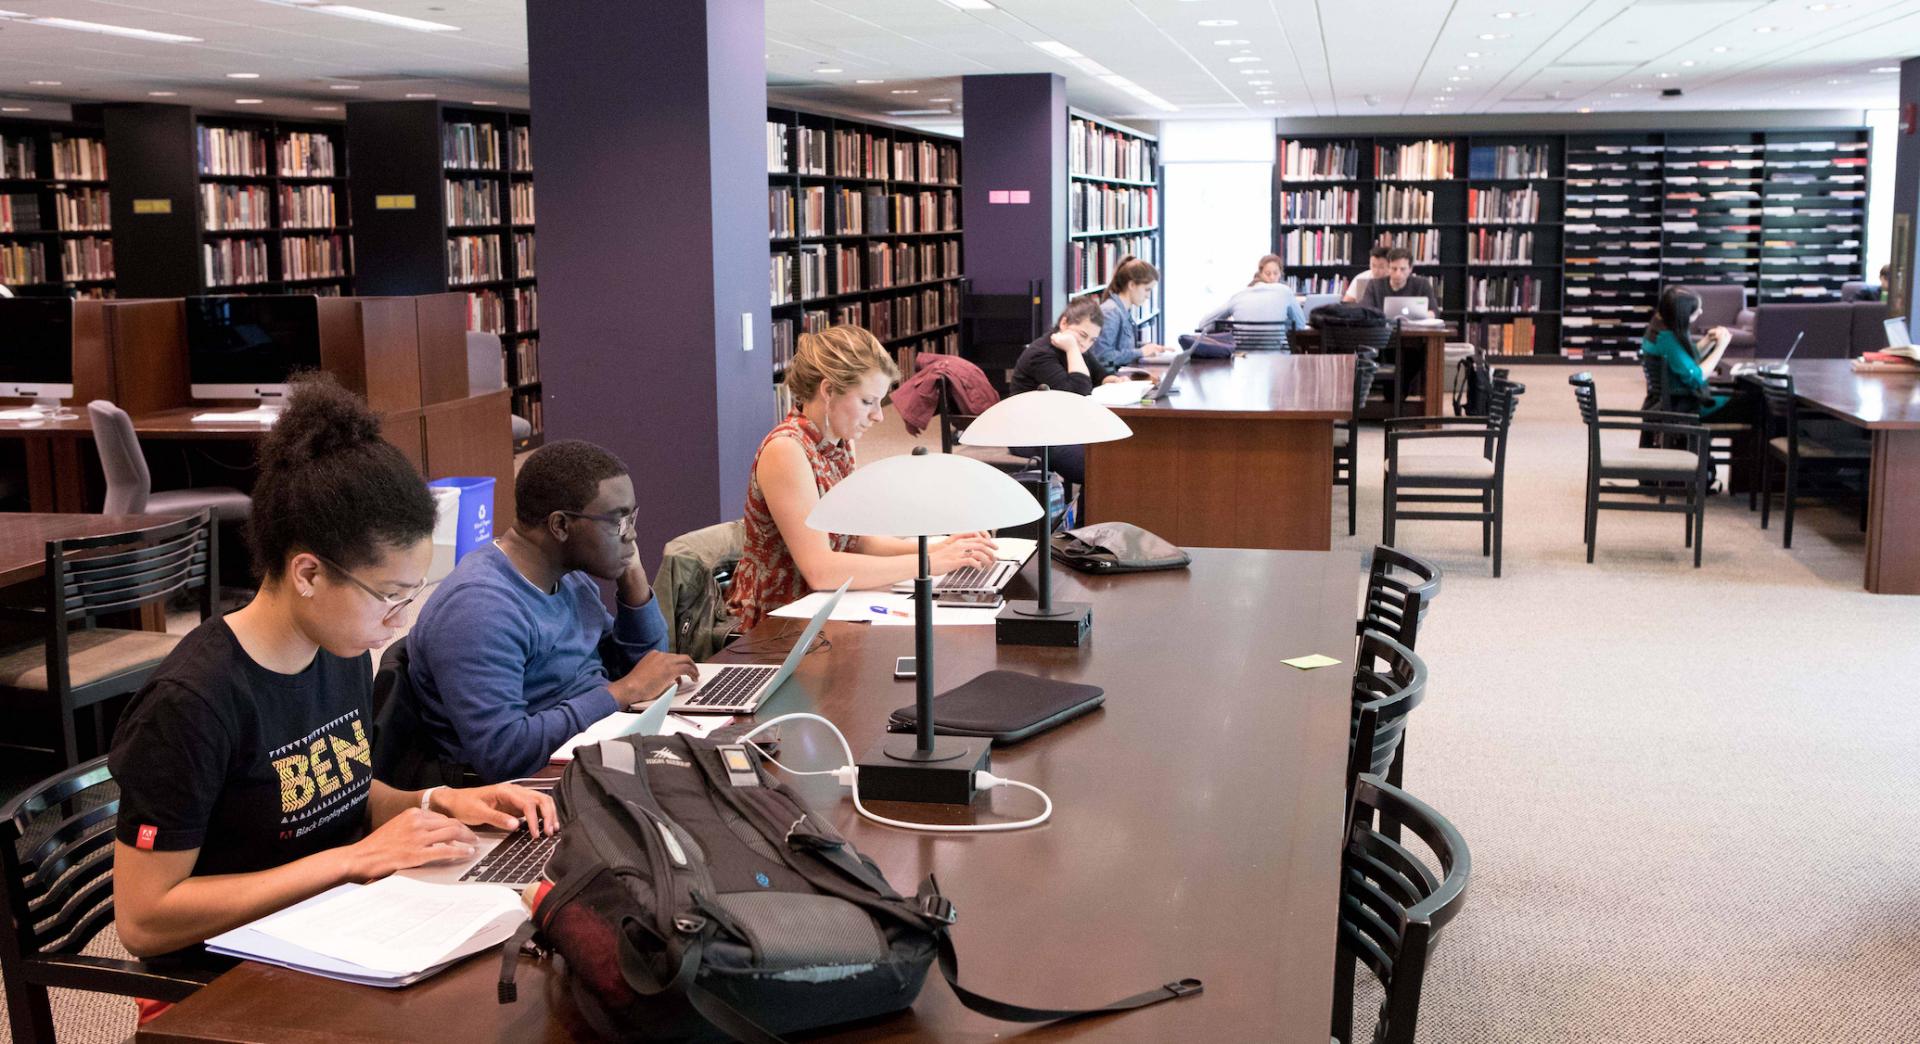 Marquand main study area